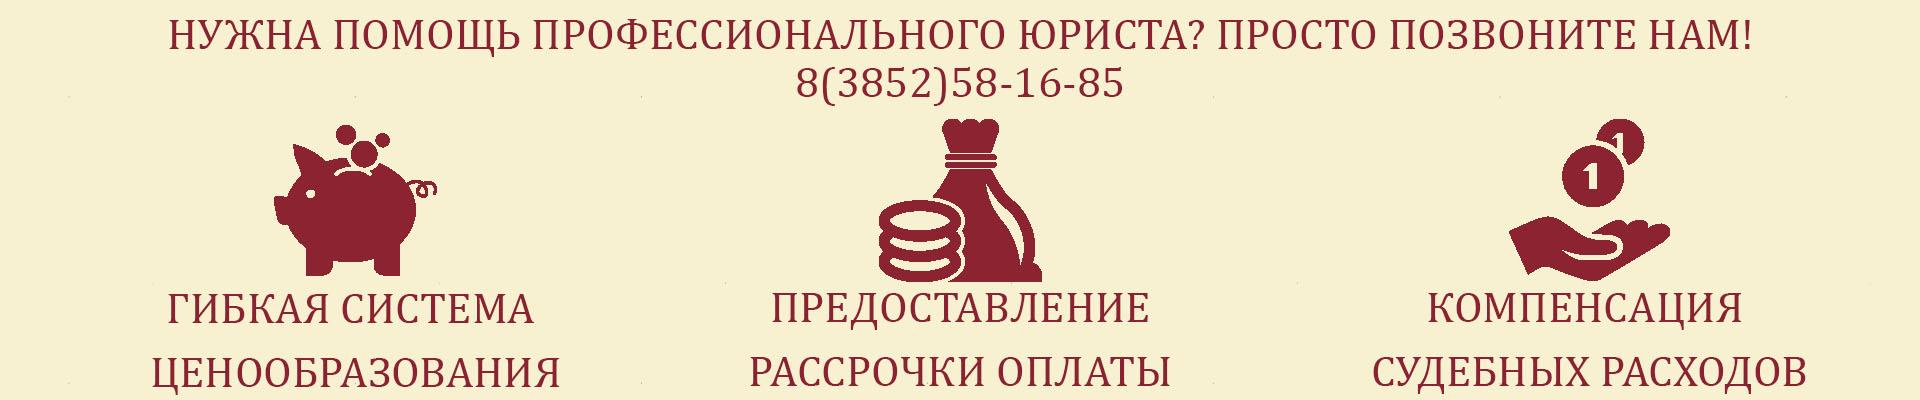 proverennyj_yurist_v_barnaule